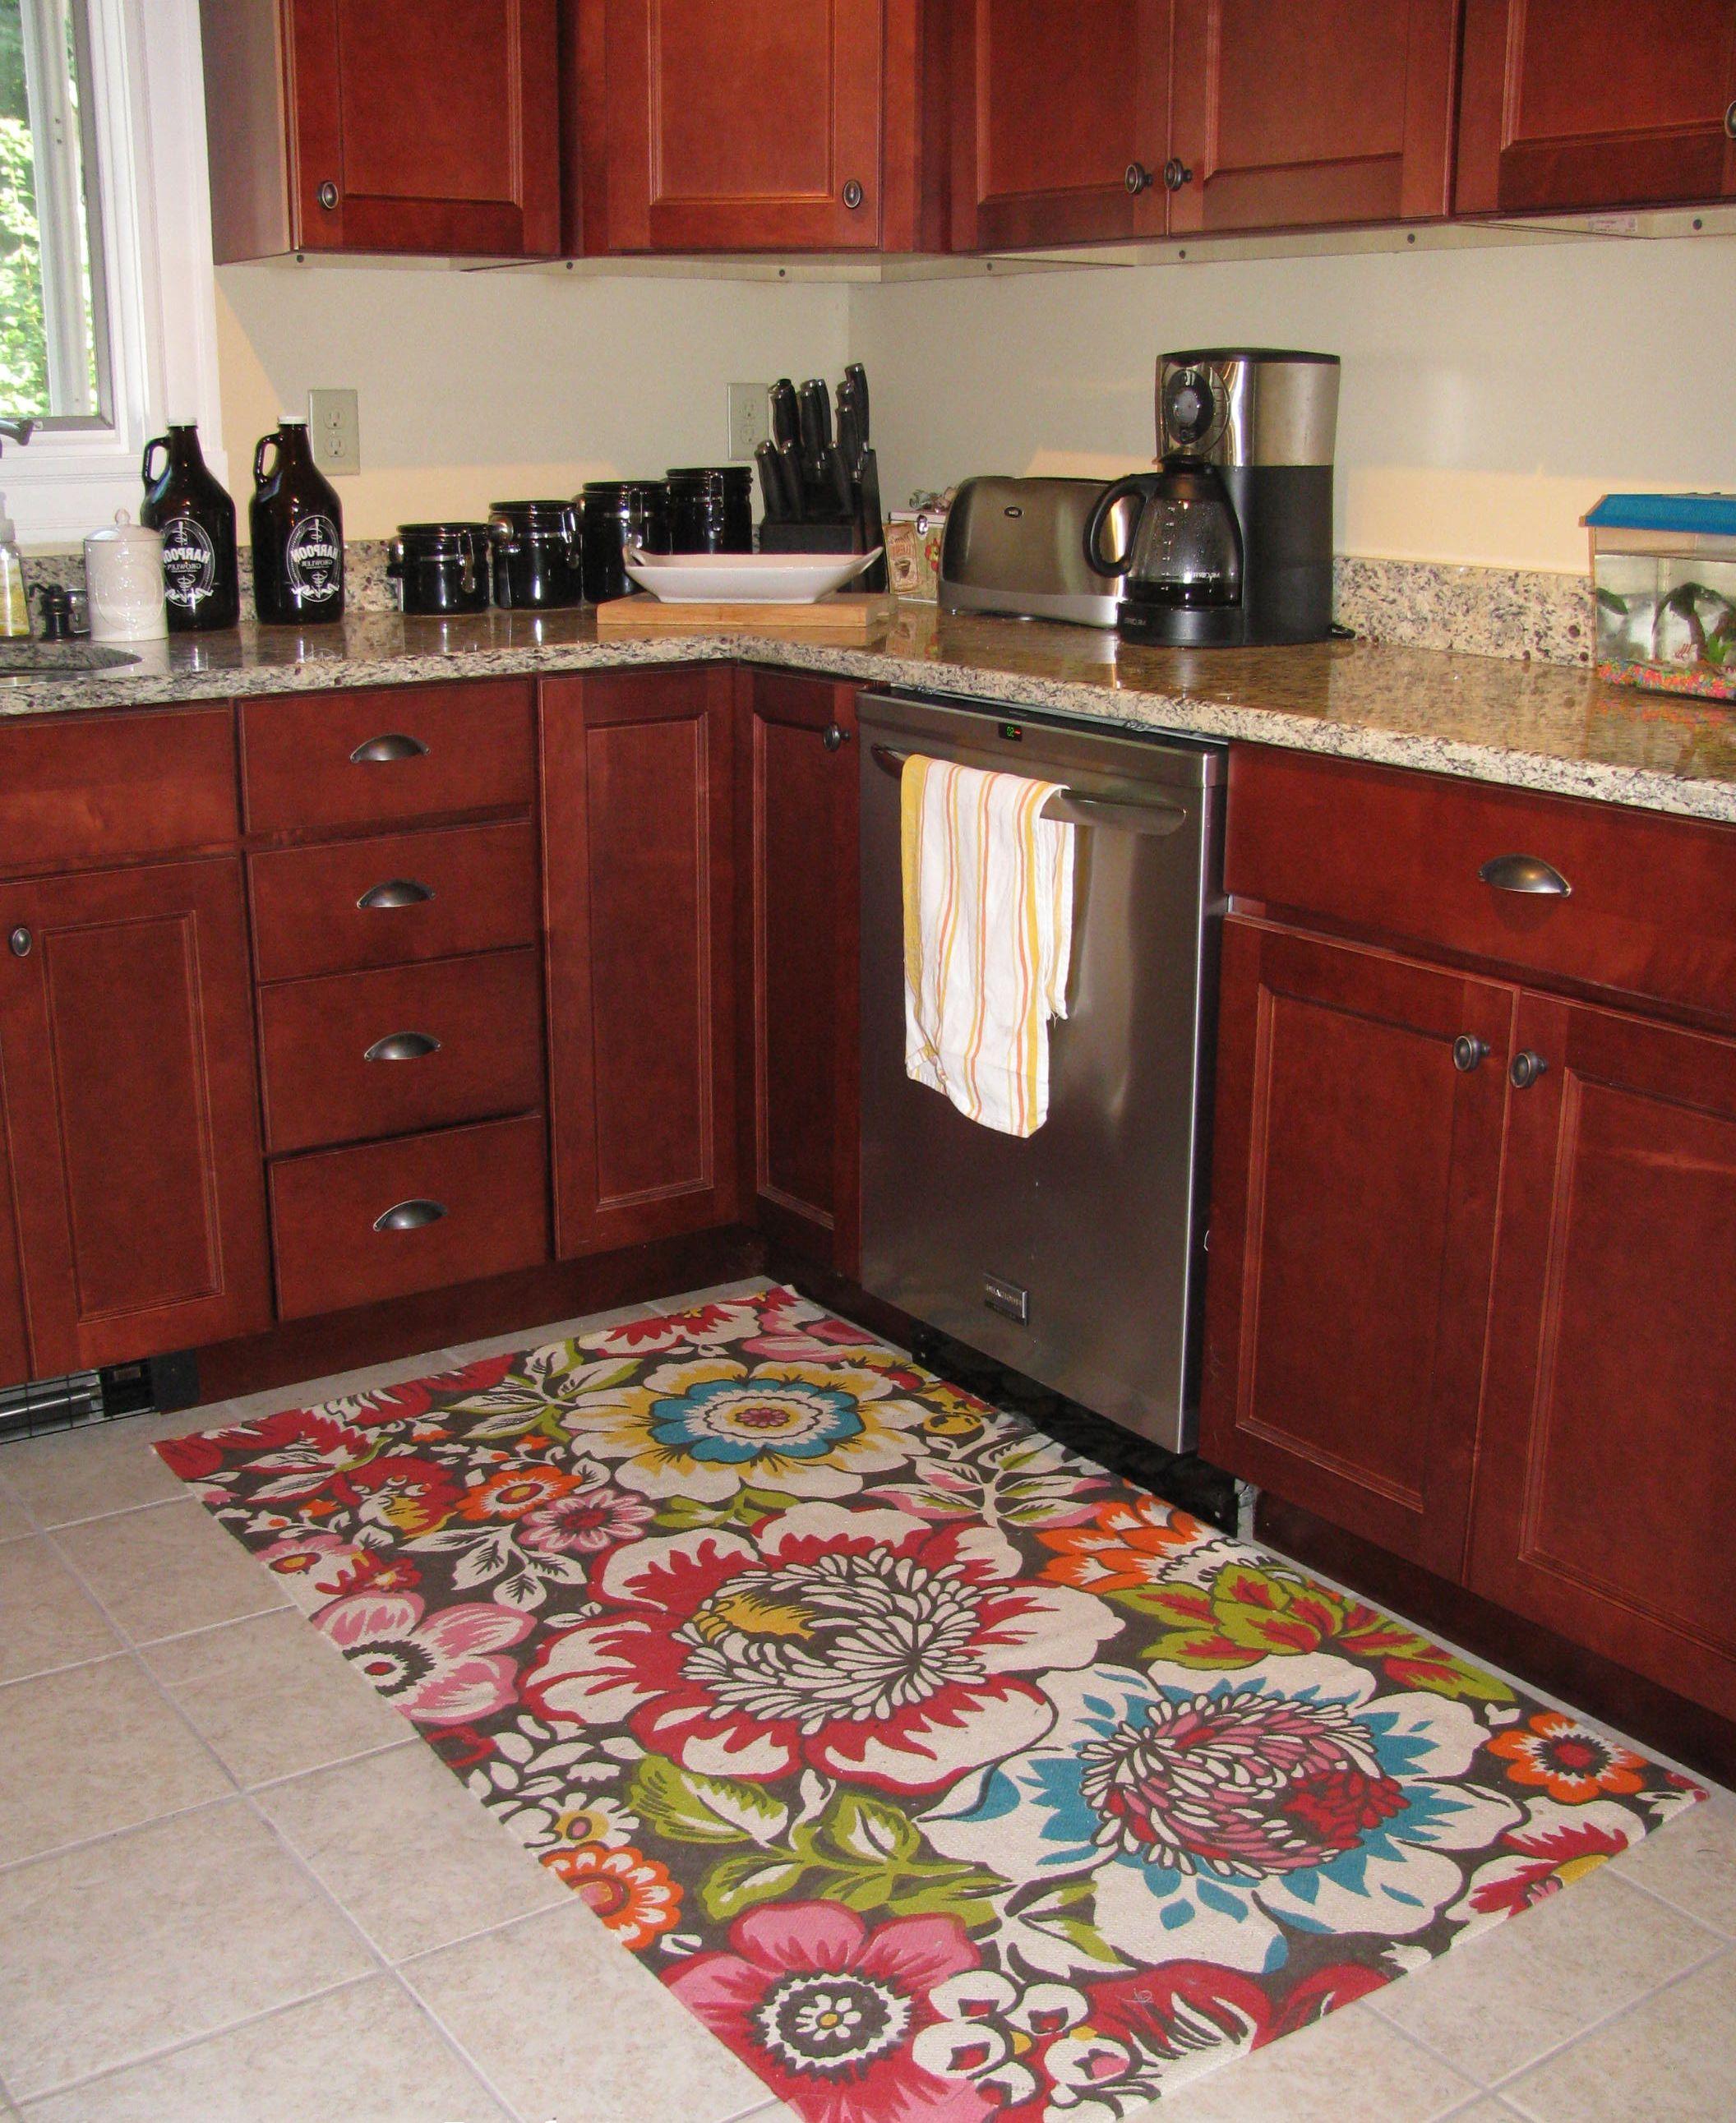 kitchen rug full size of kitchen:superb kitchen comfort mat runner colorful rugs  turquoise kitchen MDRFGYT